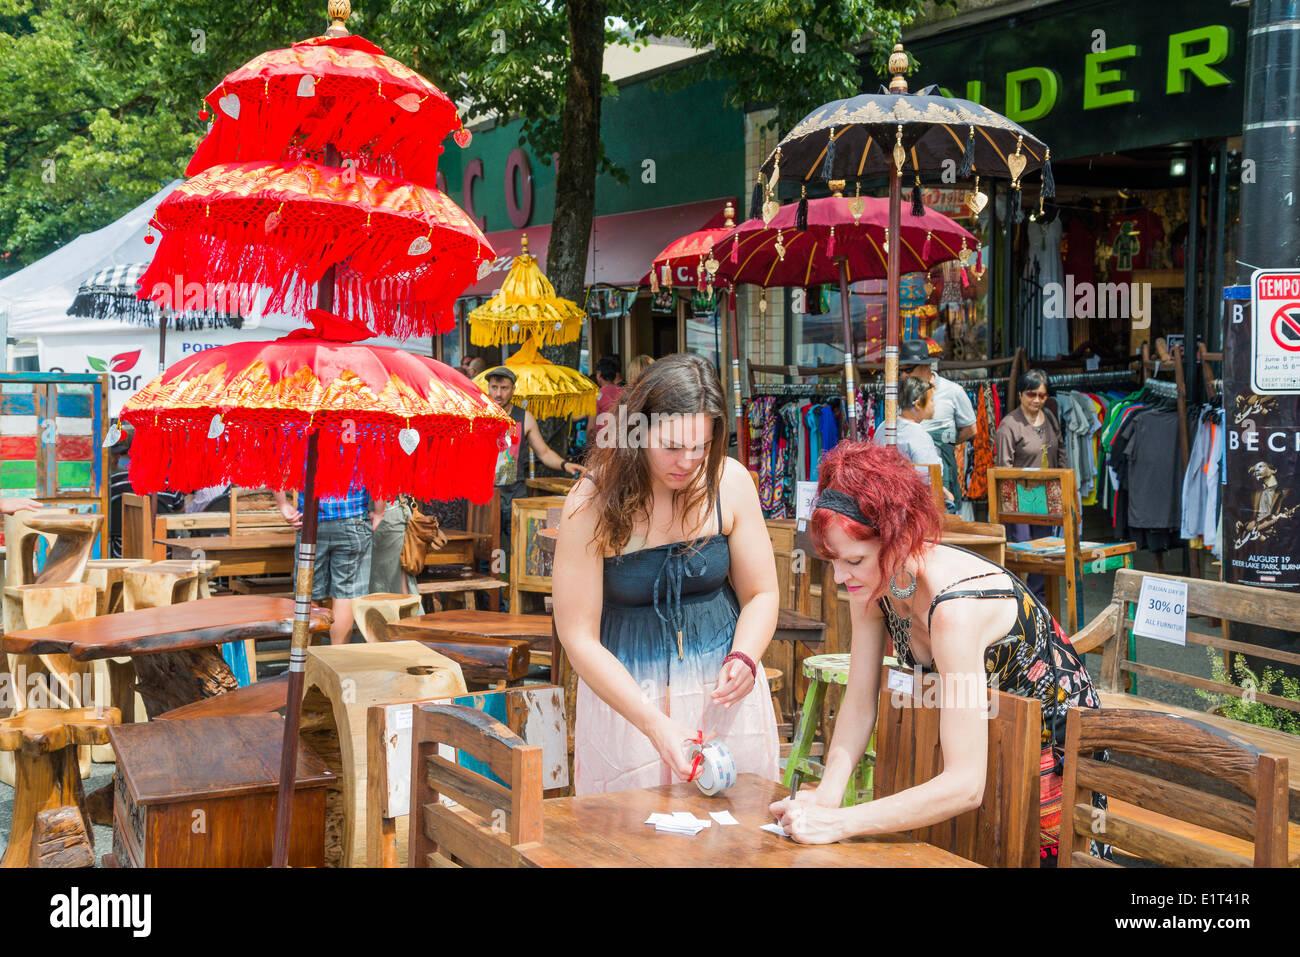 Outdoor-Möbel und Sonnenschirm Bürgersteig Verkauf, Commercial Drive, Vancouver, Britisch-Kolumbien, Kanada Stockbild